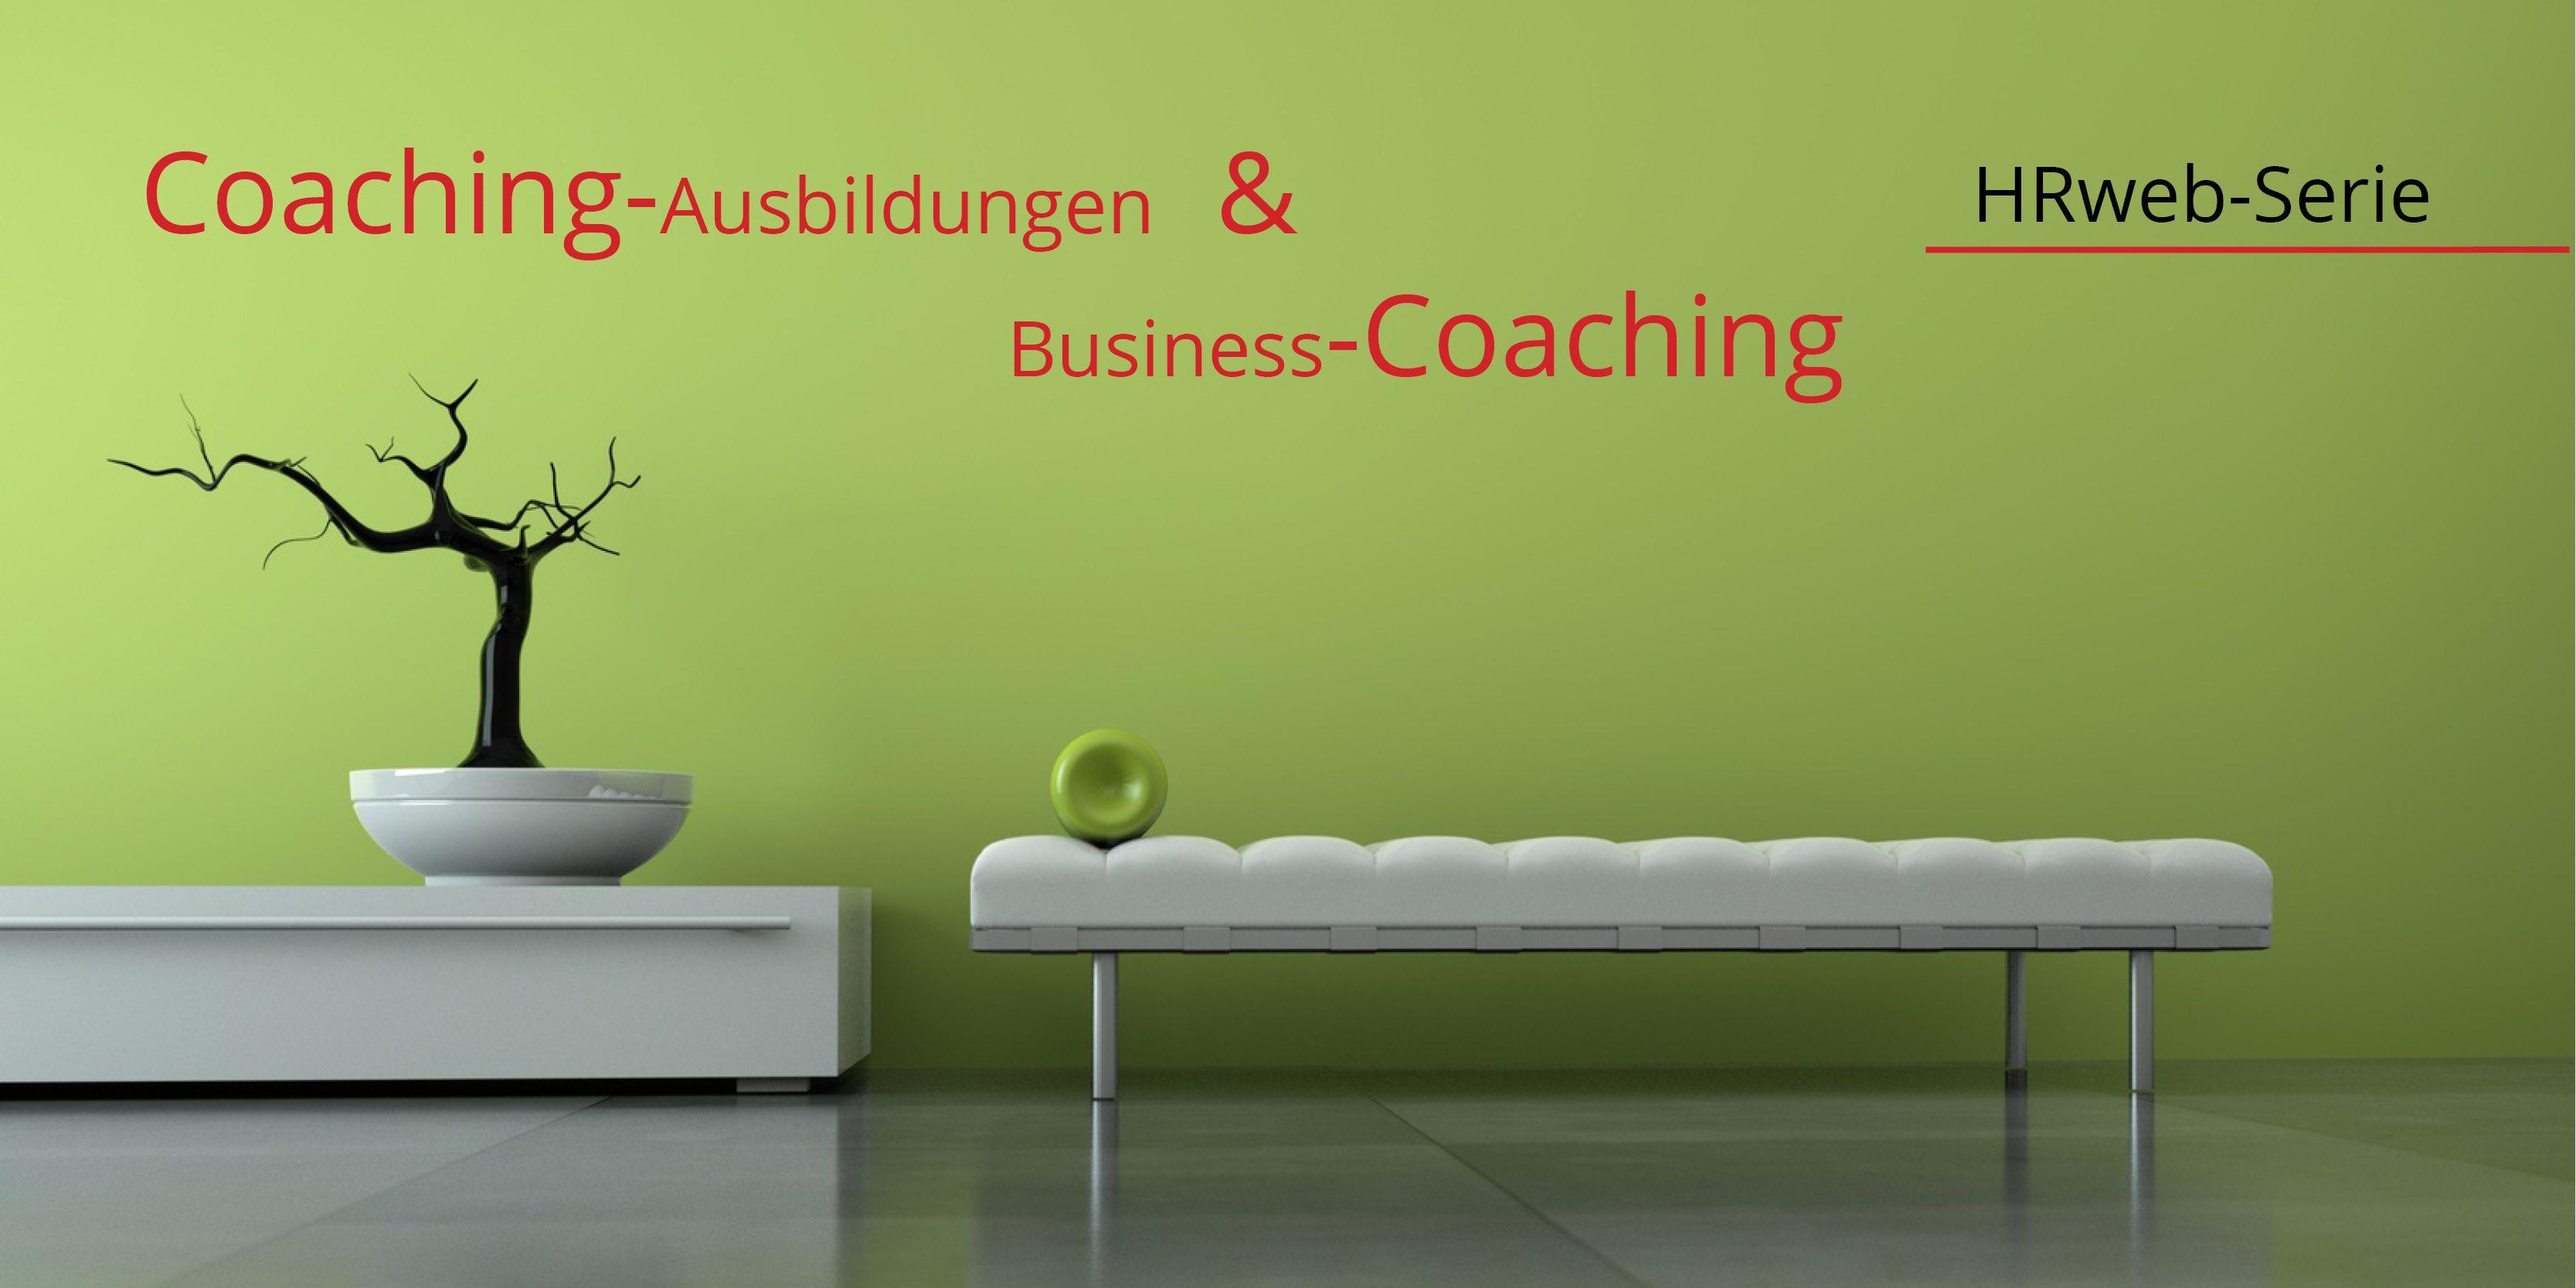 Coaching Ausbildung Österreich, Wien, Business Coaching Wien